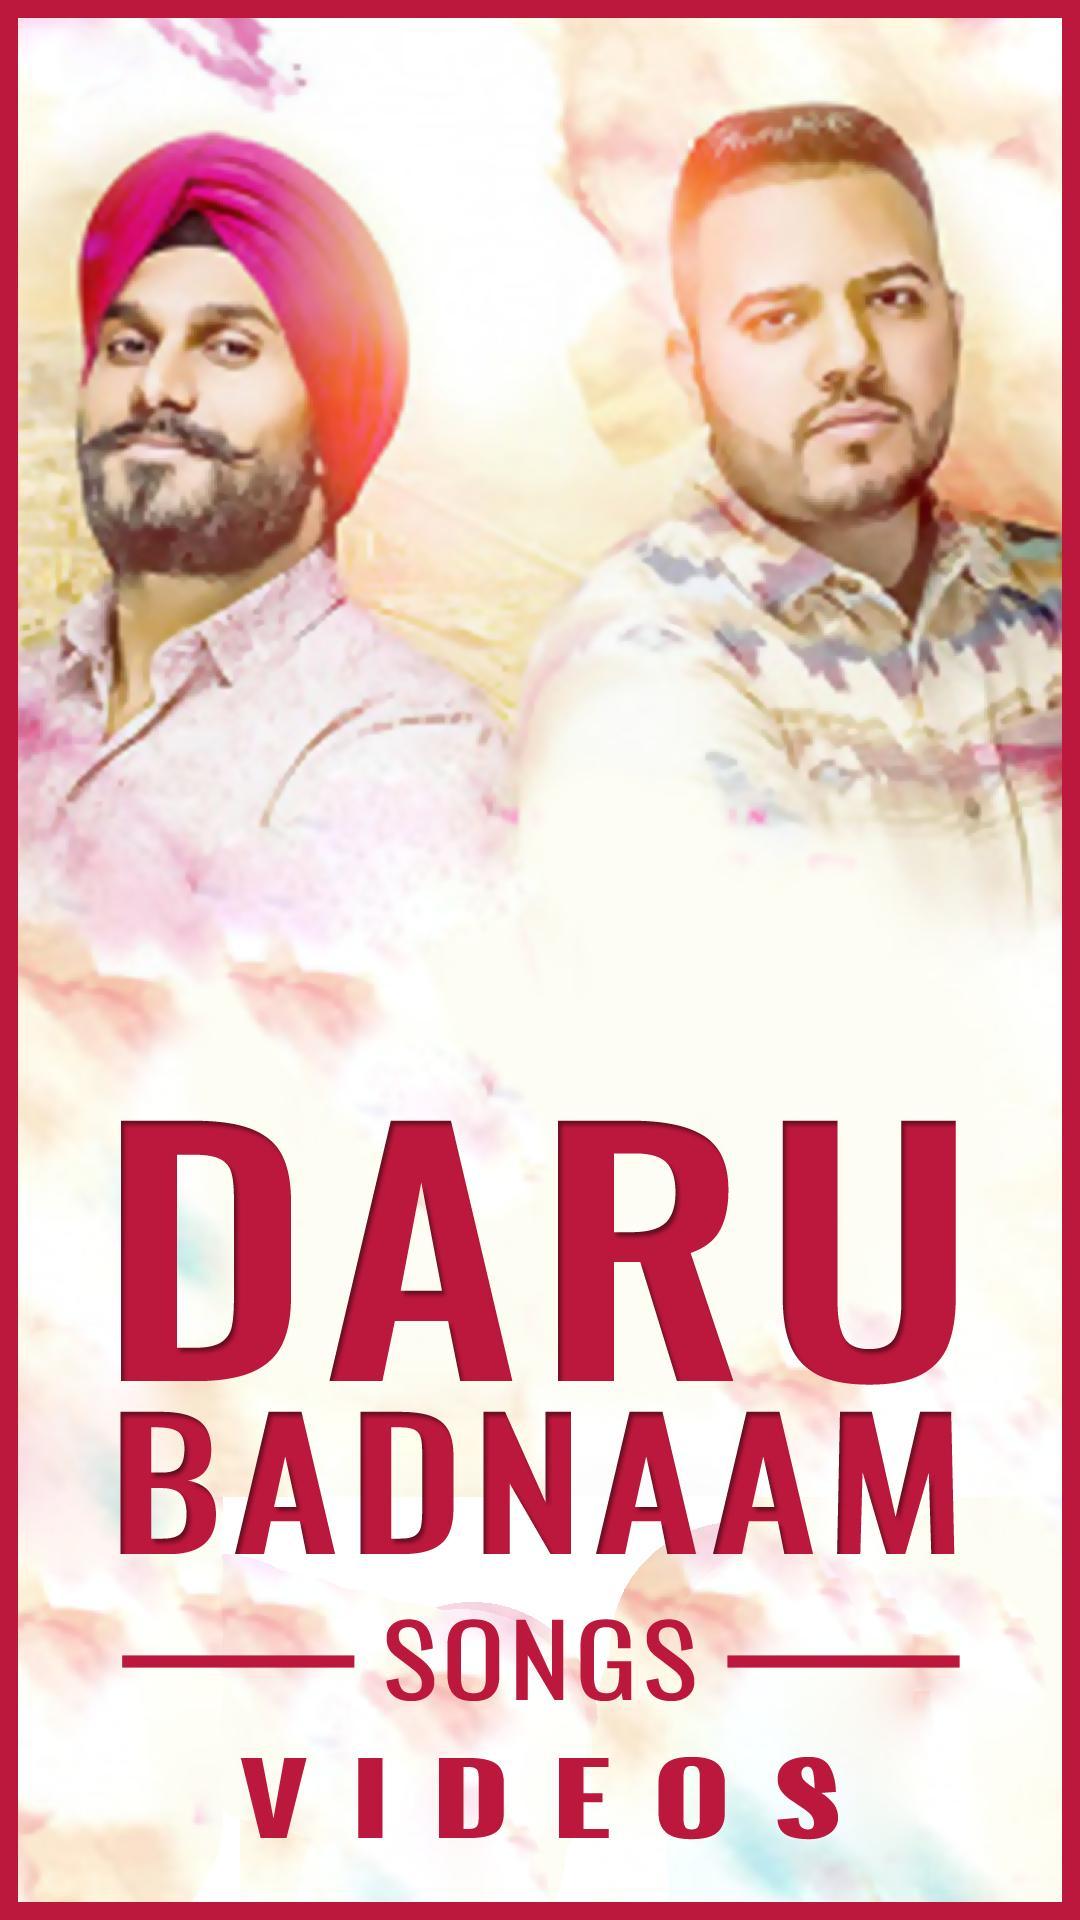 ✨ Badnaam punjabi song remix mp3 download | Daru Badnaam (Remix